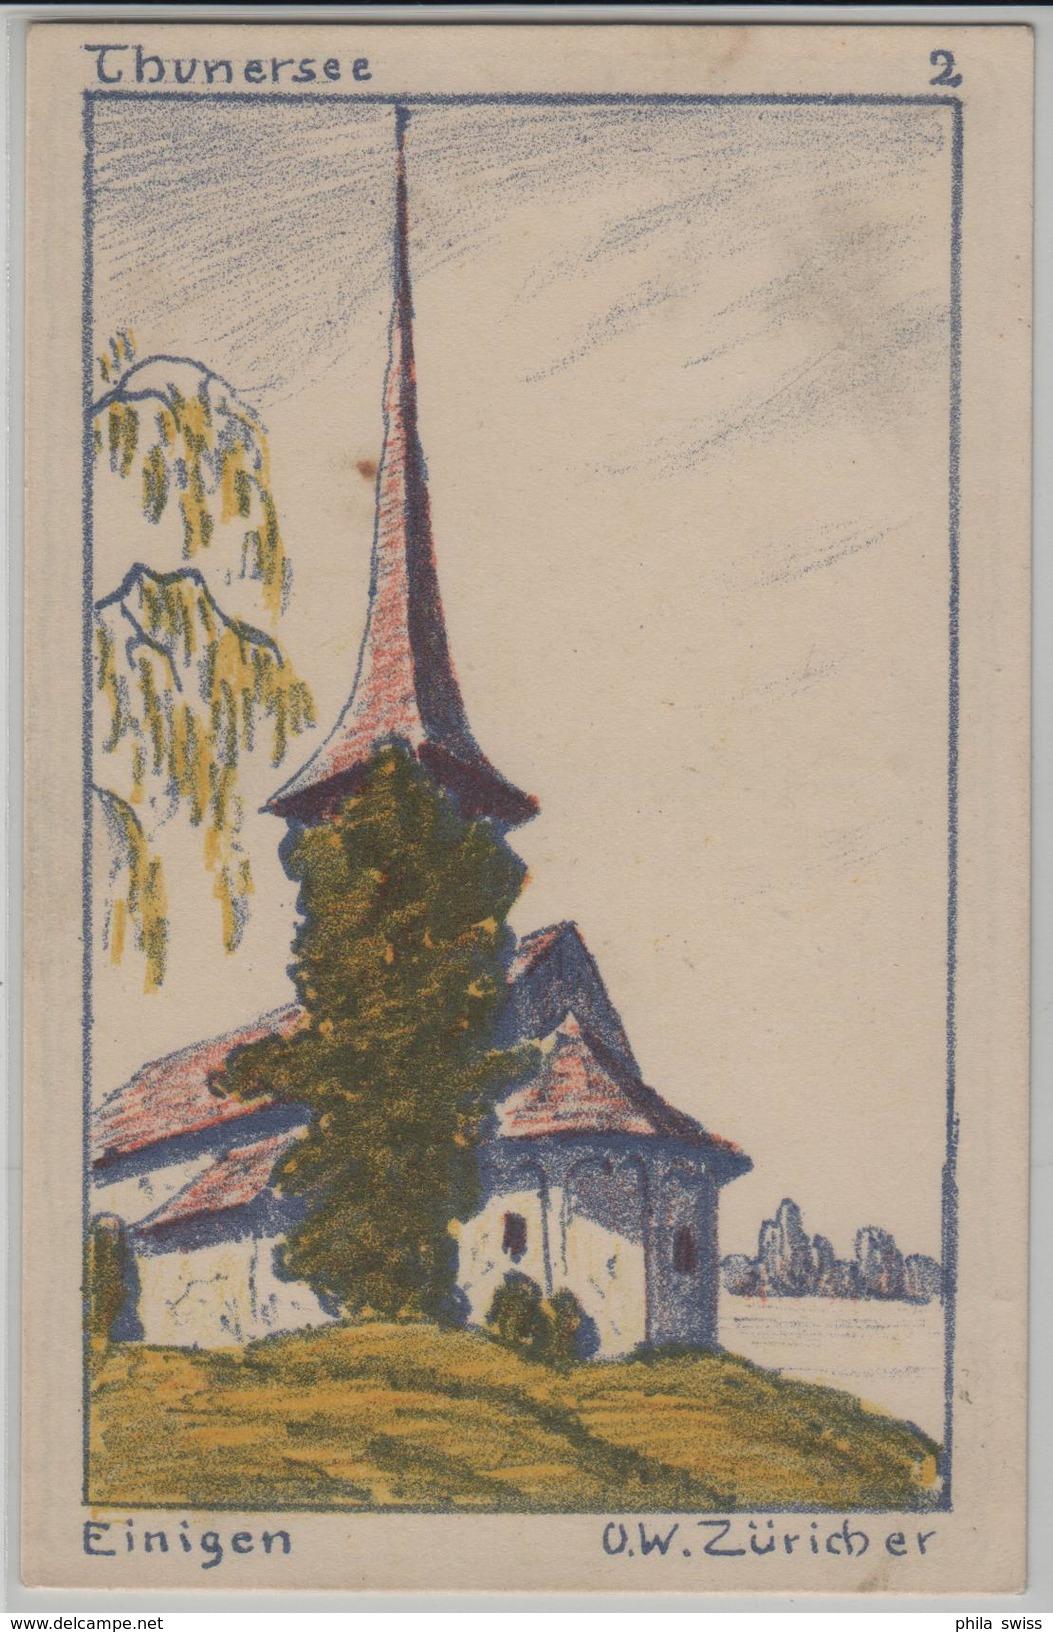 Einigen Thunersee Kirche - Künstlerkarte U.W. Züricher - BE Berne